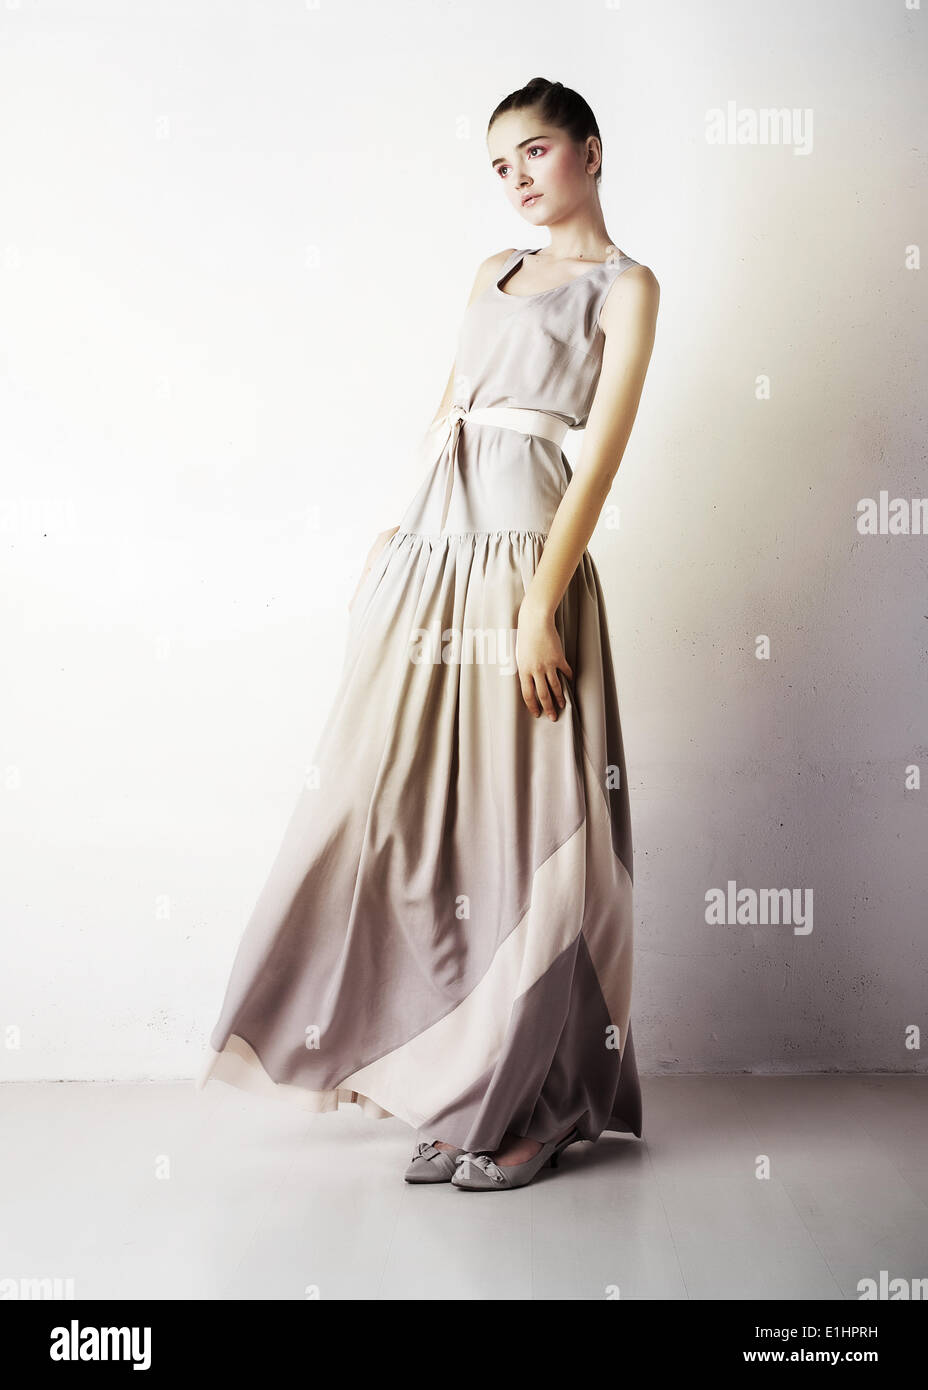 Joven romántica belleza moda vestido vestidos de blanco Imagen De Stock